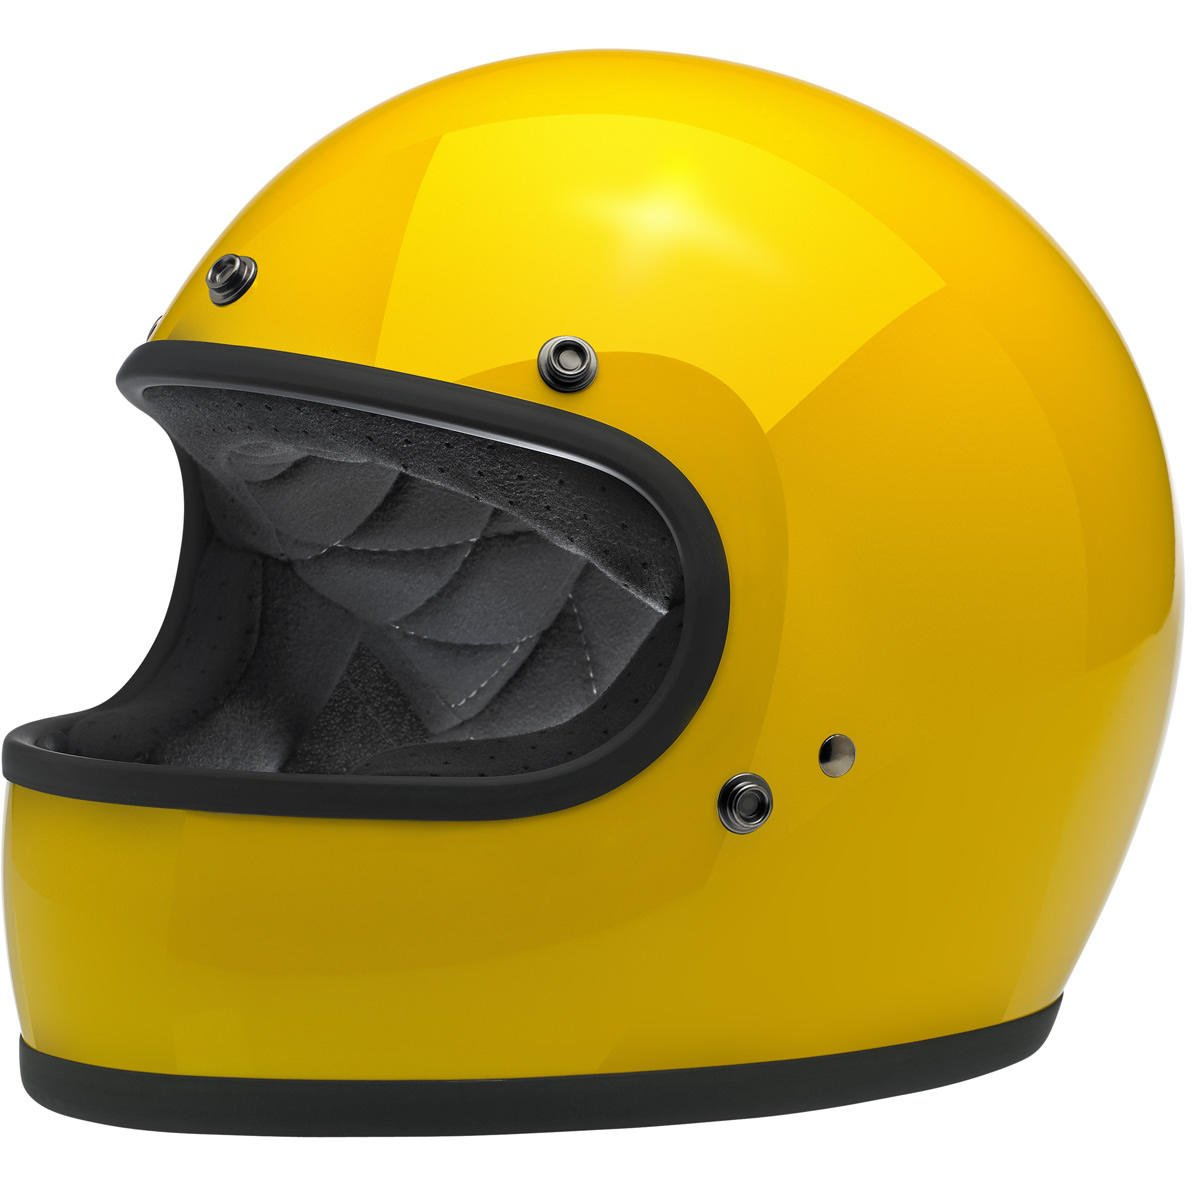 Biltwell Unisex-Adult Full face Gringo Helmet GH-SRA-MT-DOT-XLG Sierra Green, X-Large